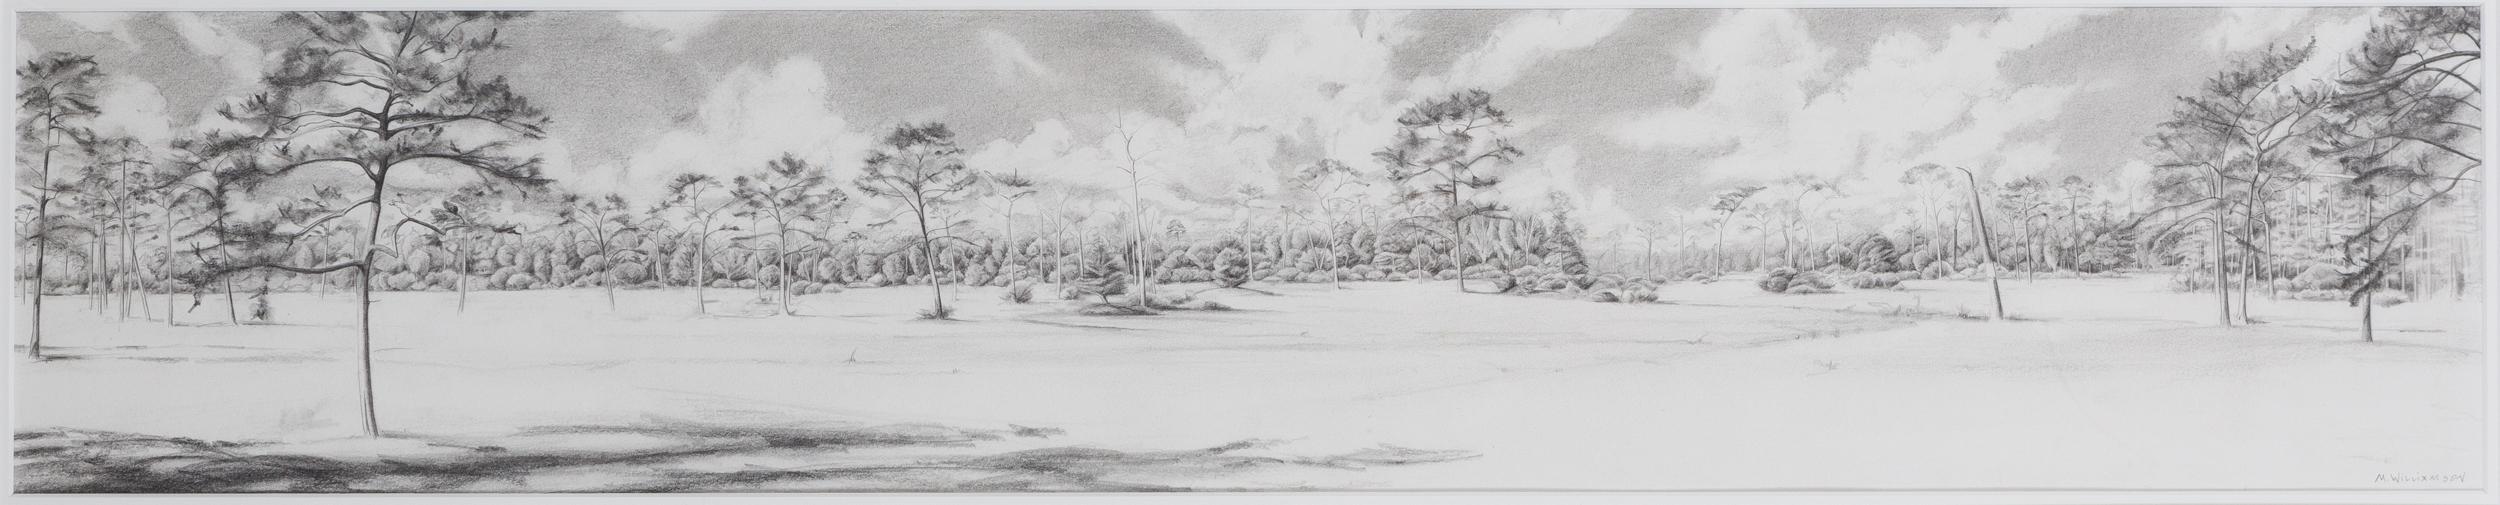 Landscape, 210 West.jpg